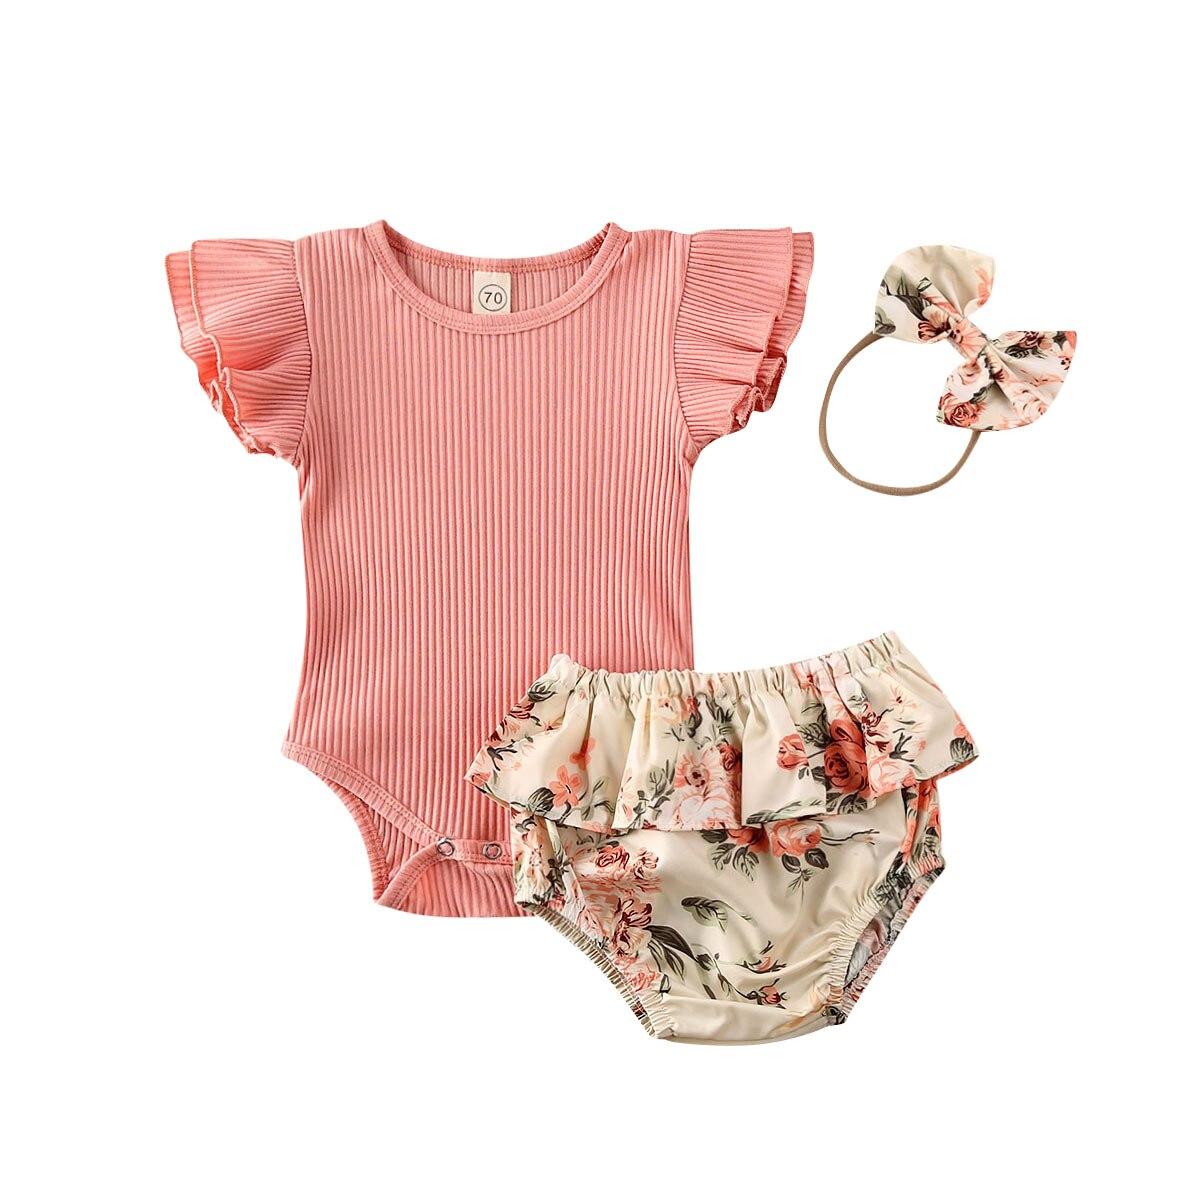 3Pcs Infant Kids Baby Girls Clothes Sets Pink Ruffles Sleeve Romper Tops+Flowers Shorts+Headband 0-18M